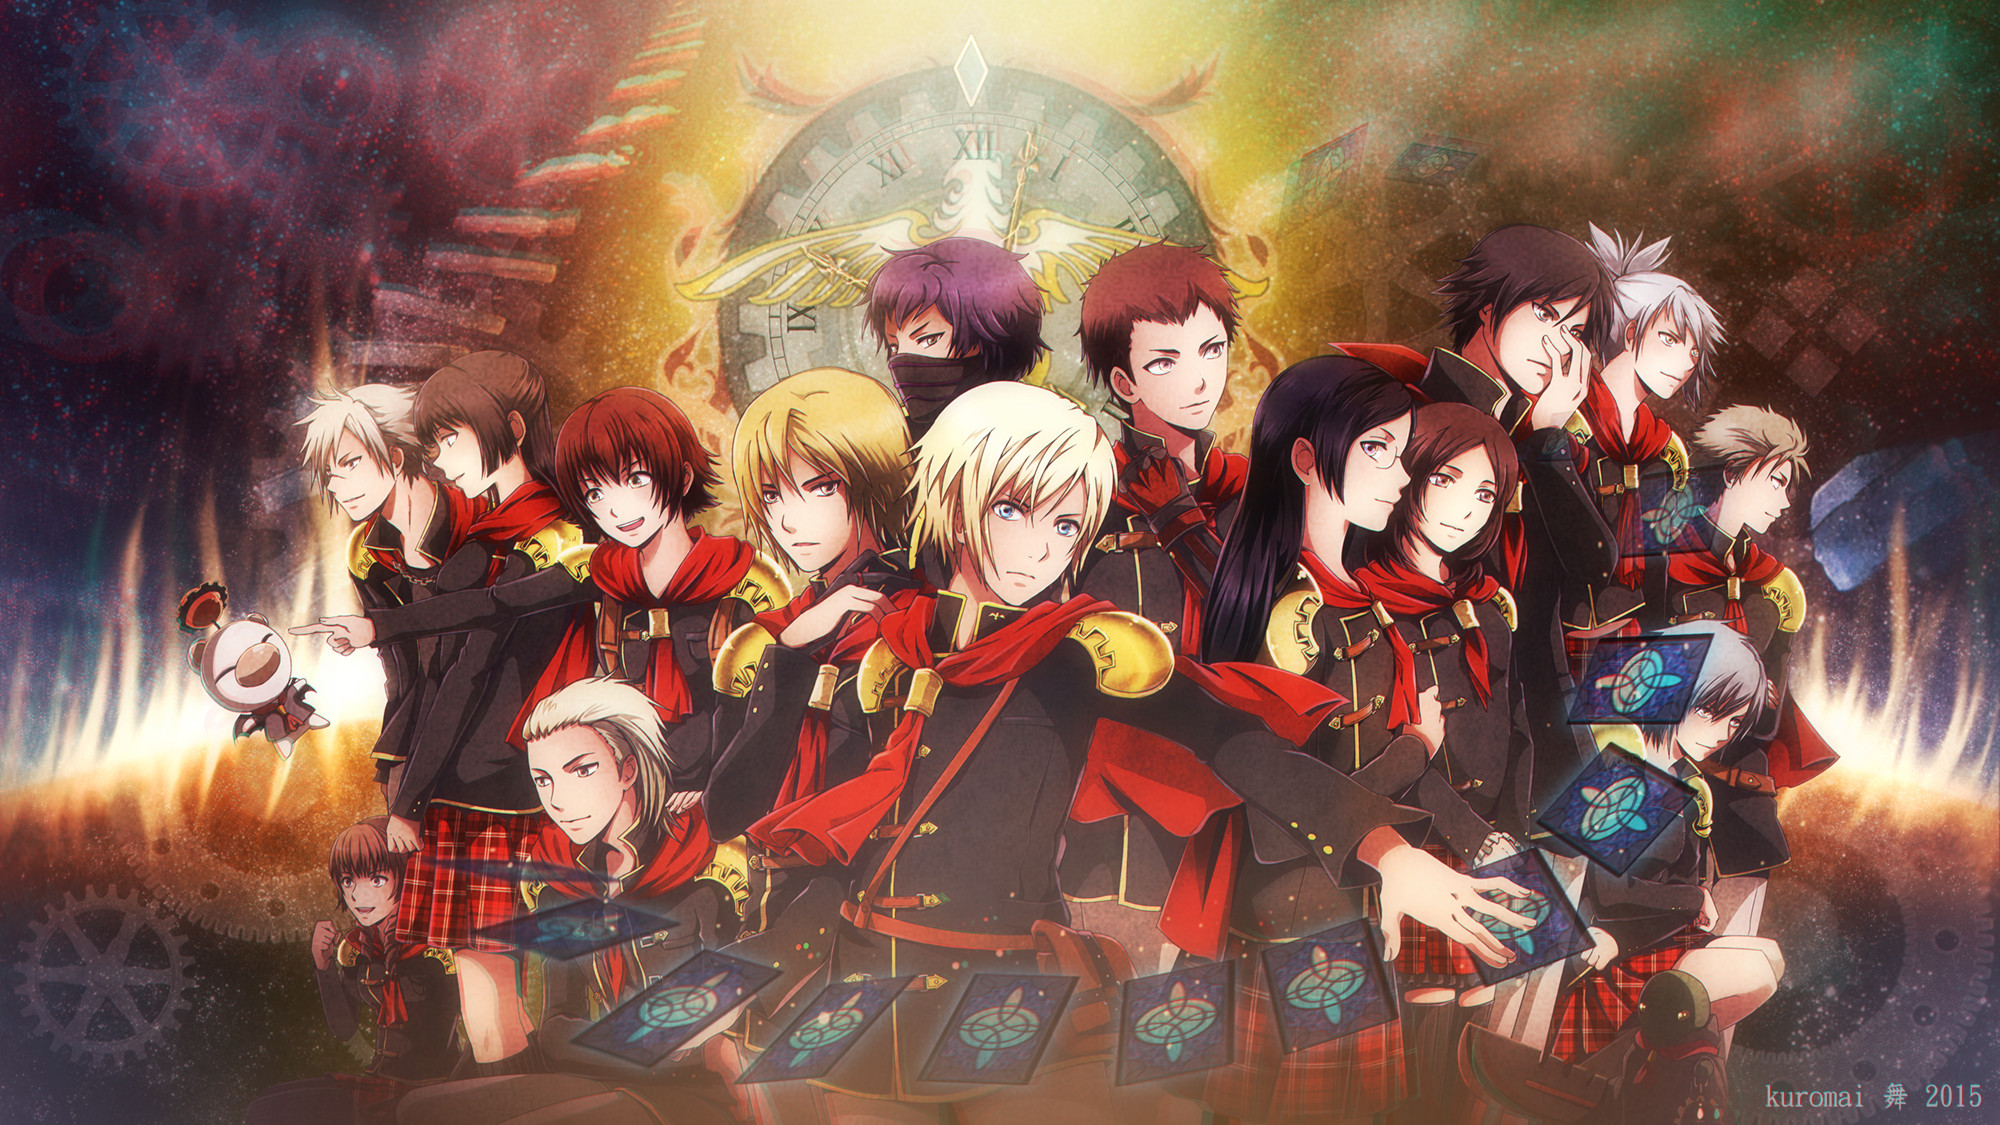 Res: 2000x1125, Tags: Anime, KuroMai, Final Fantasy Type-0, King (Final Fantasy